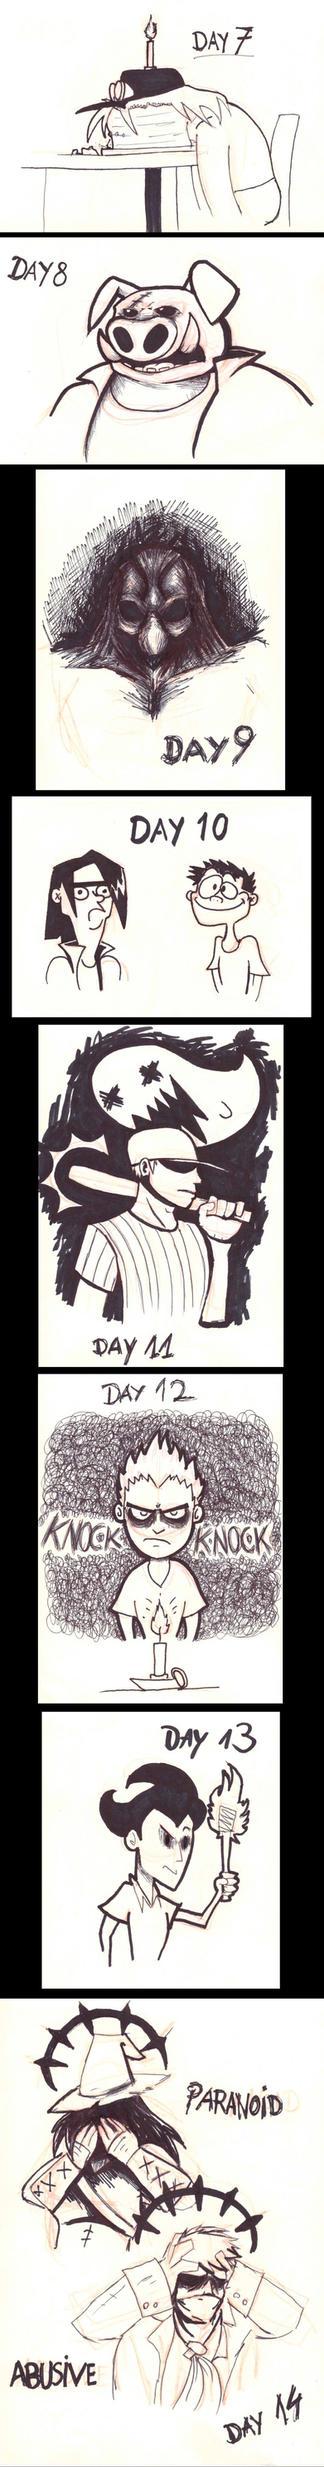 Inktober days 7-14 by Menaria